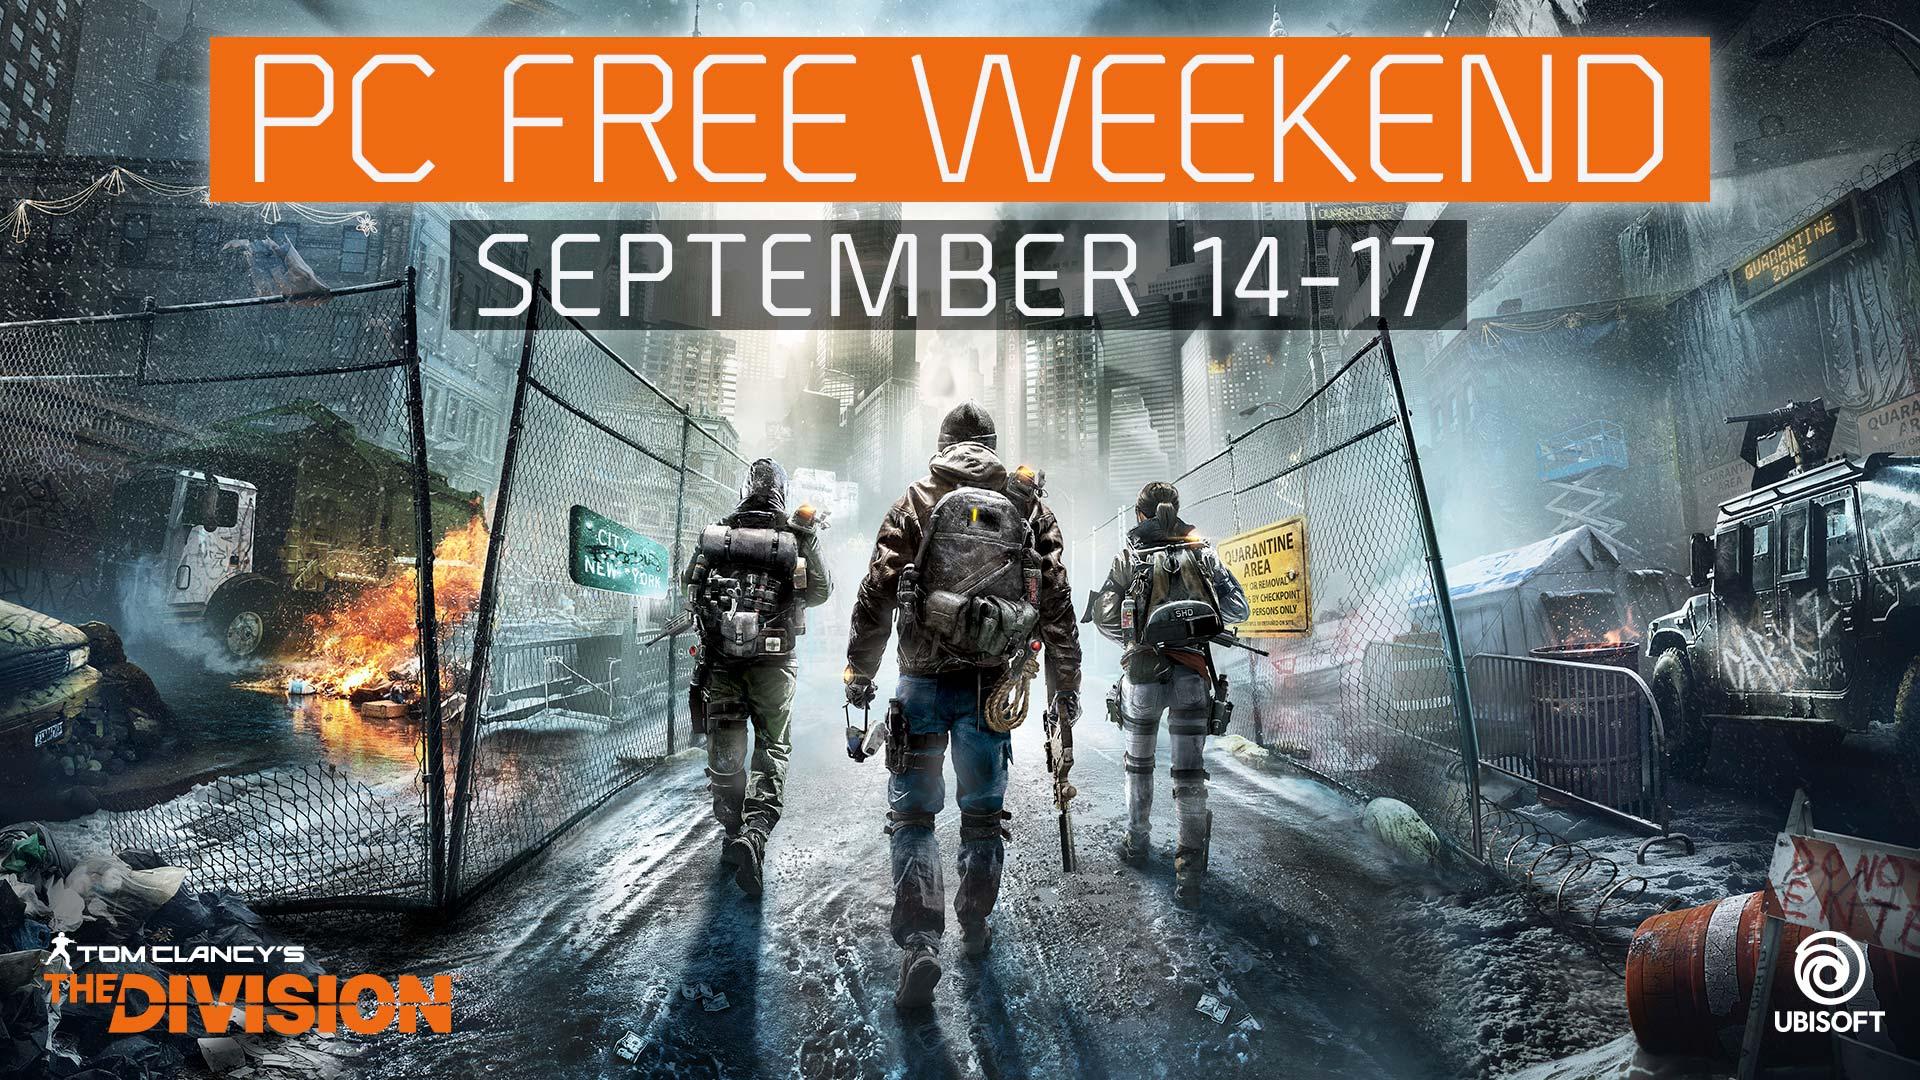 The Division se podrá descargar gratuitamente este fin de semana en PC